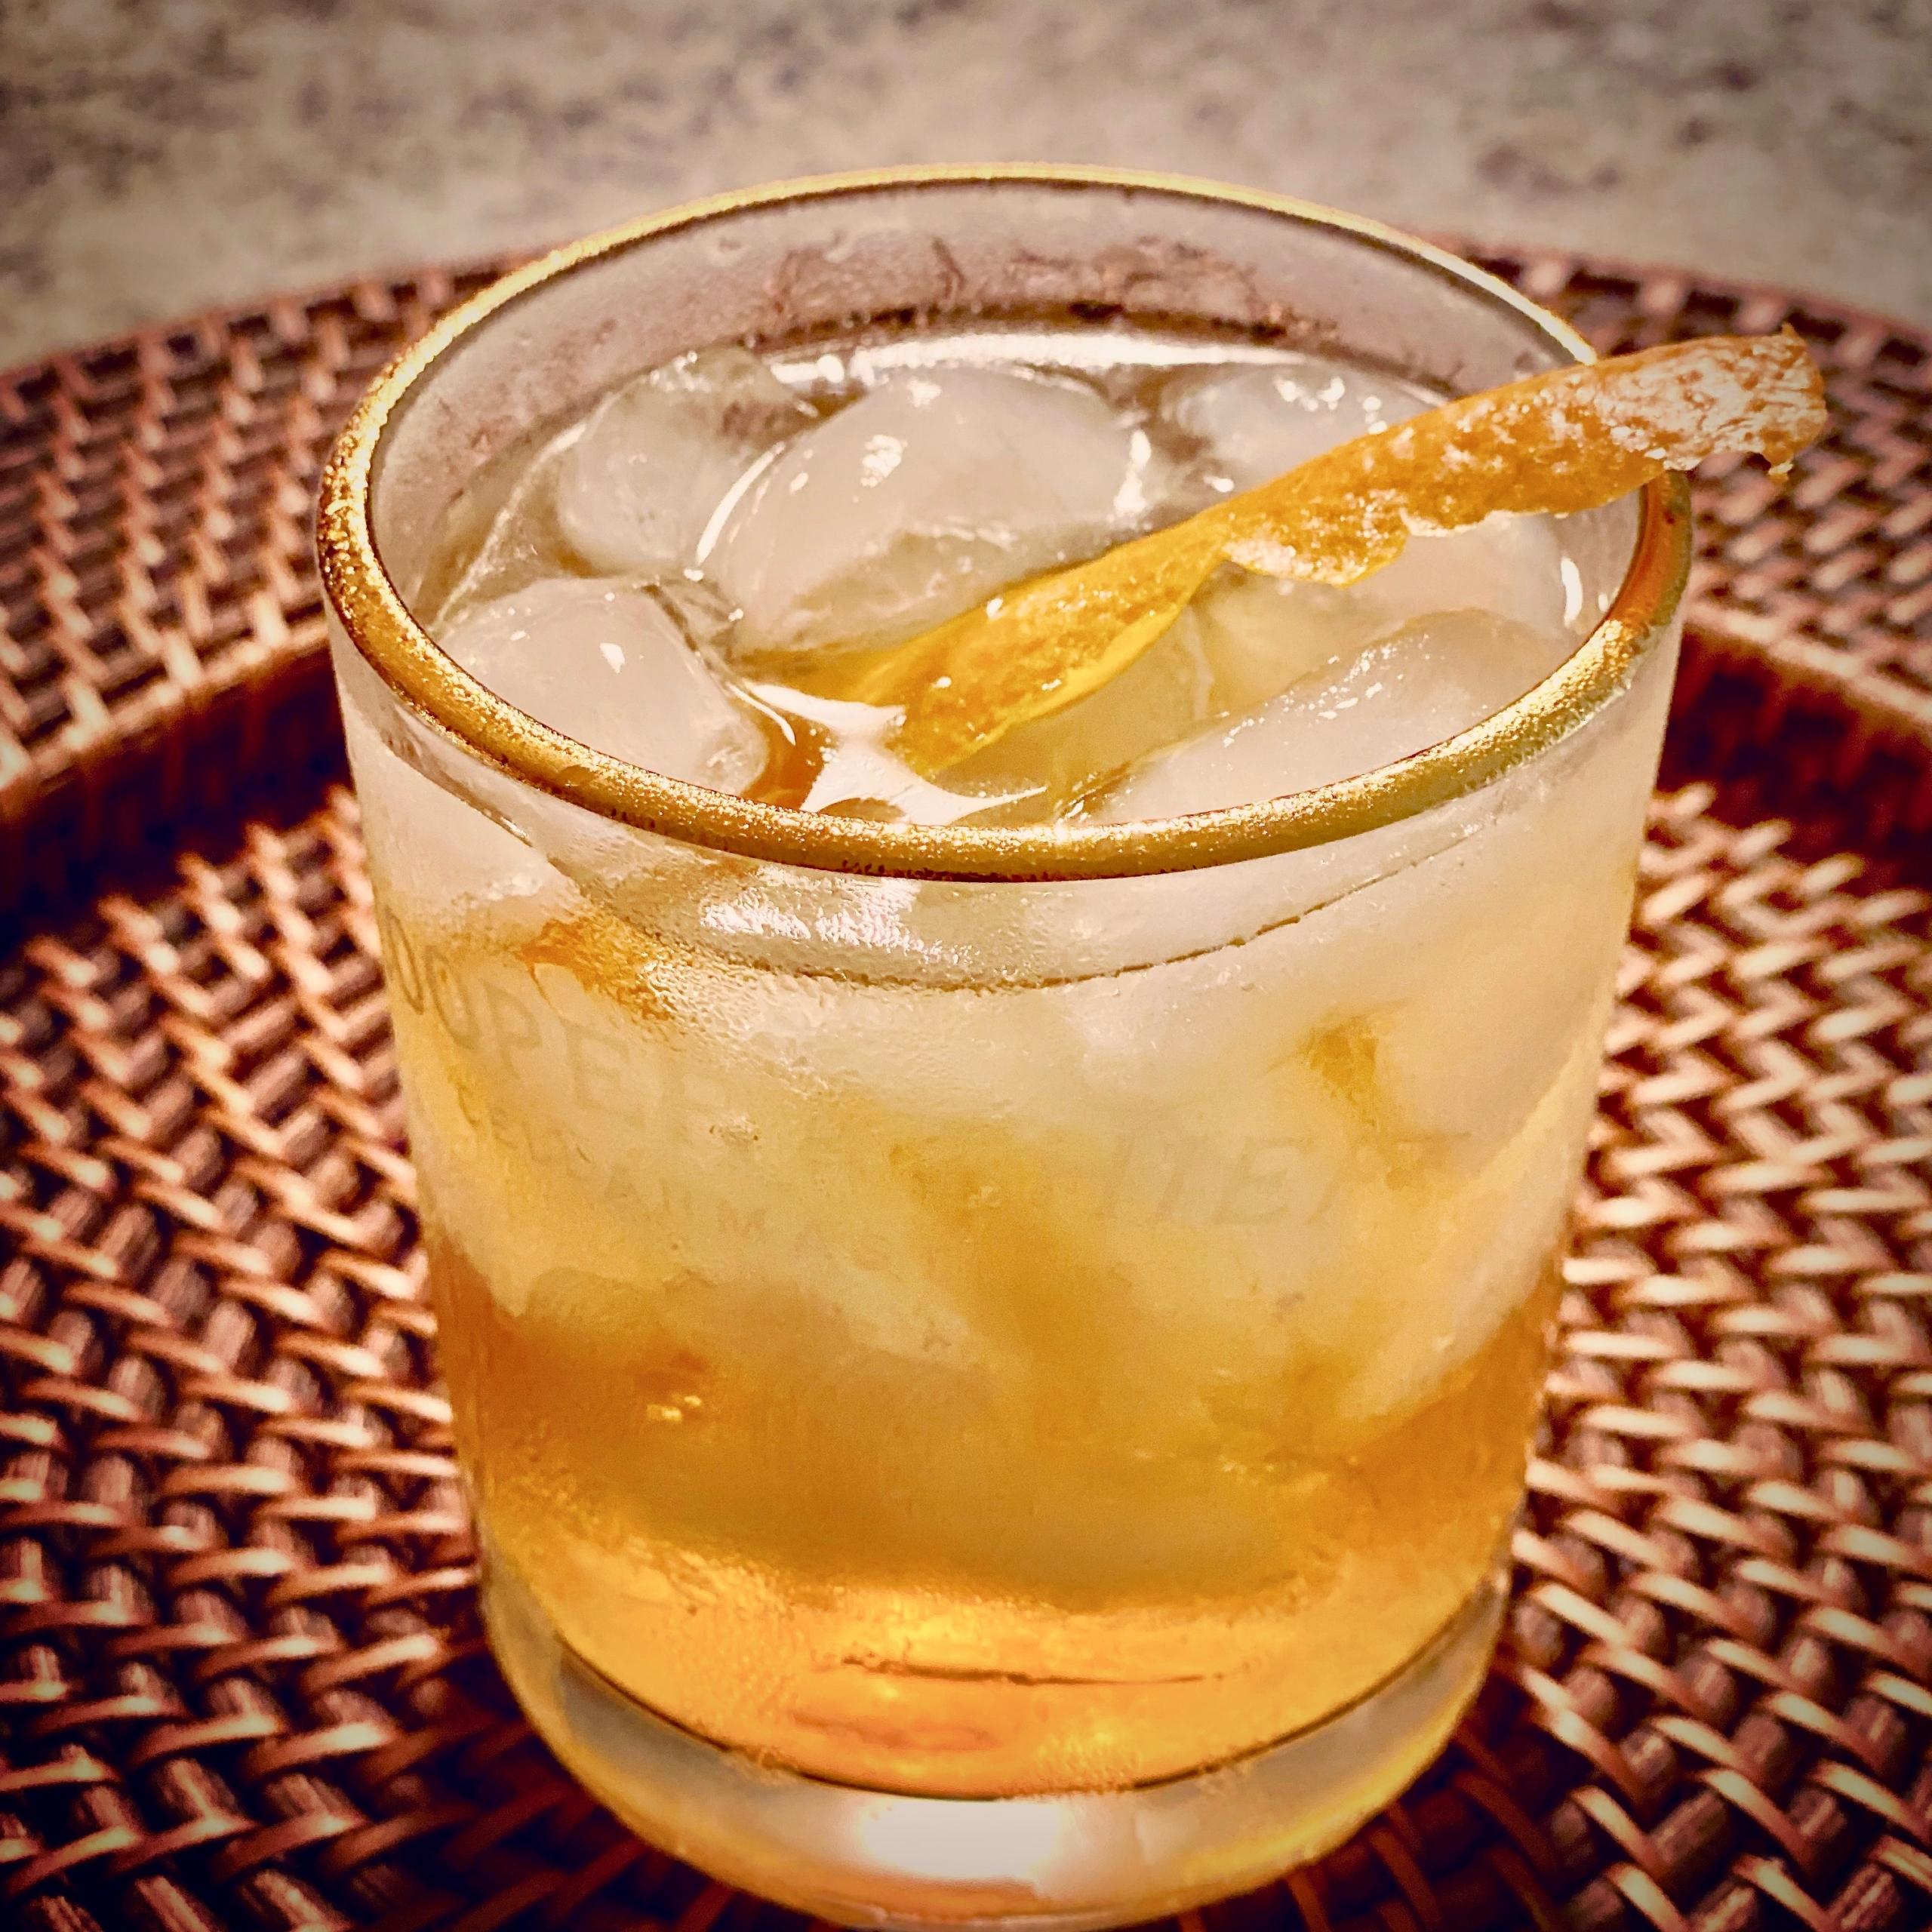 cocktail over ice with orange rind twist